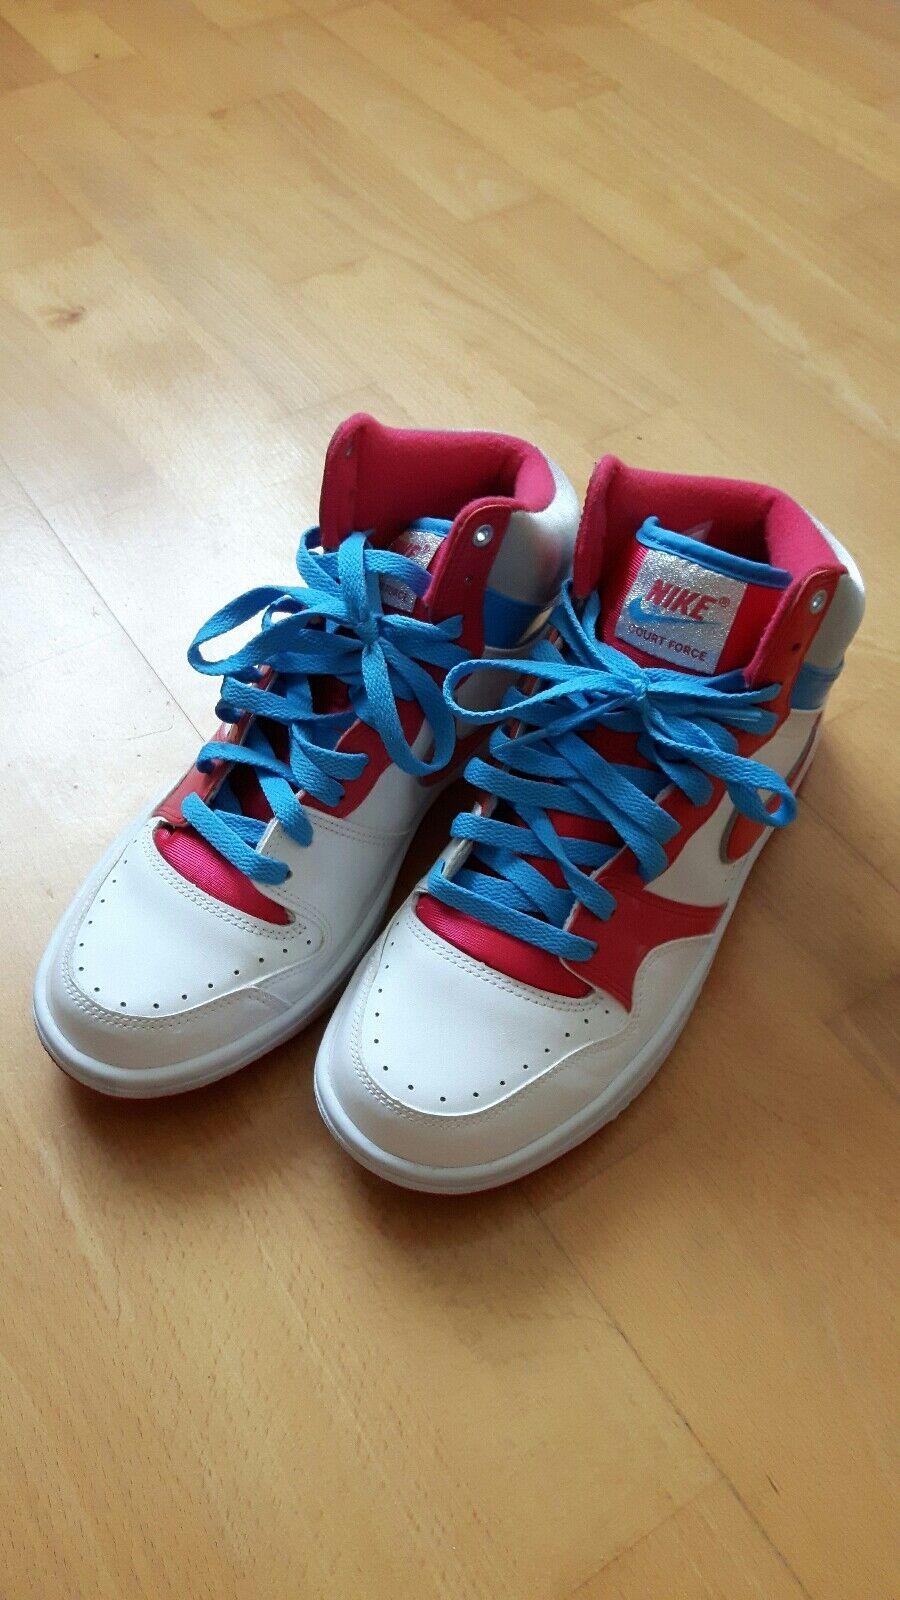 Nike Wmns Court Force Hi Pink US cm  9.5 41 26.5 cm US Jordan Lebron Kobe b76e9f